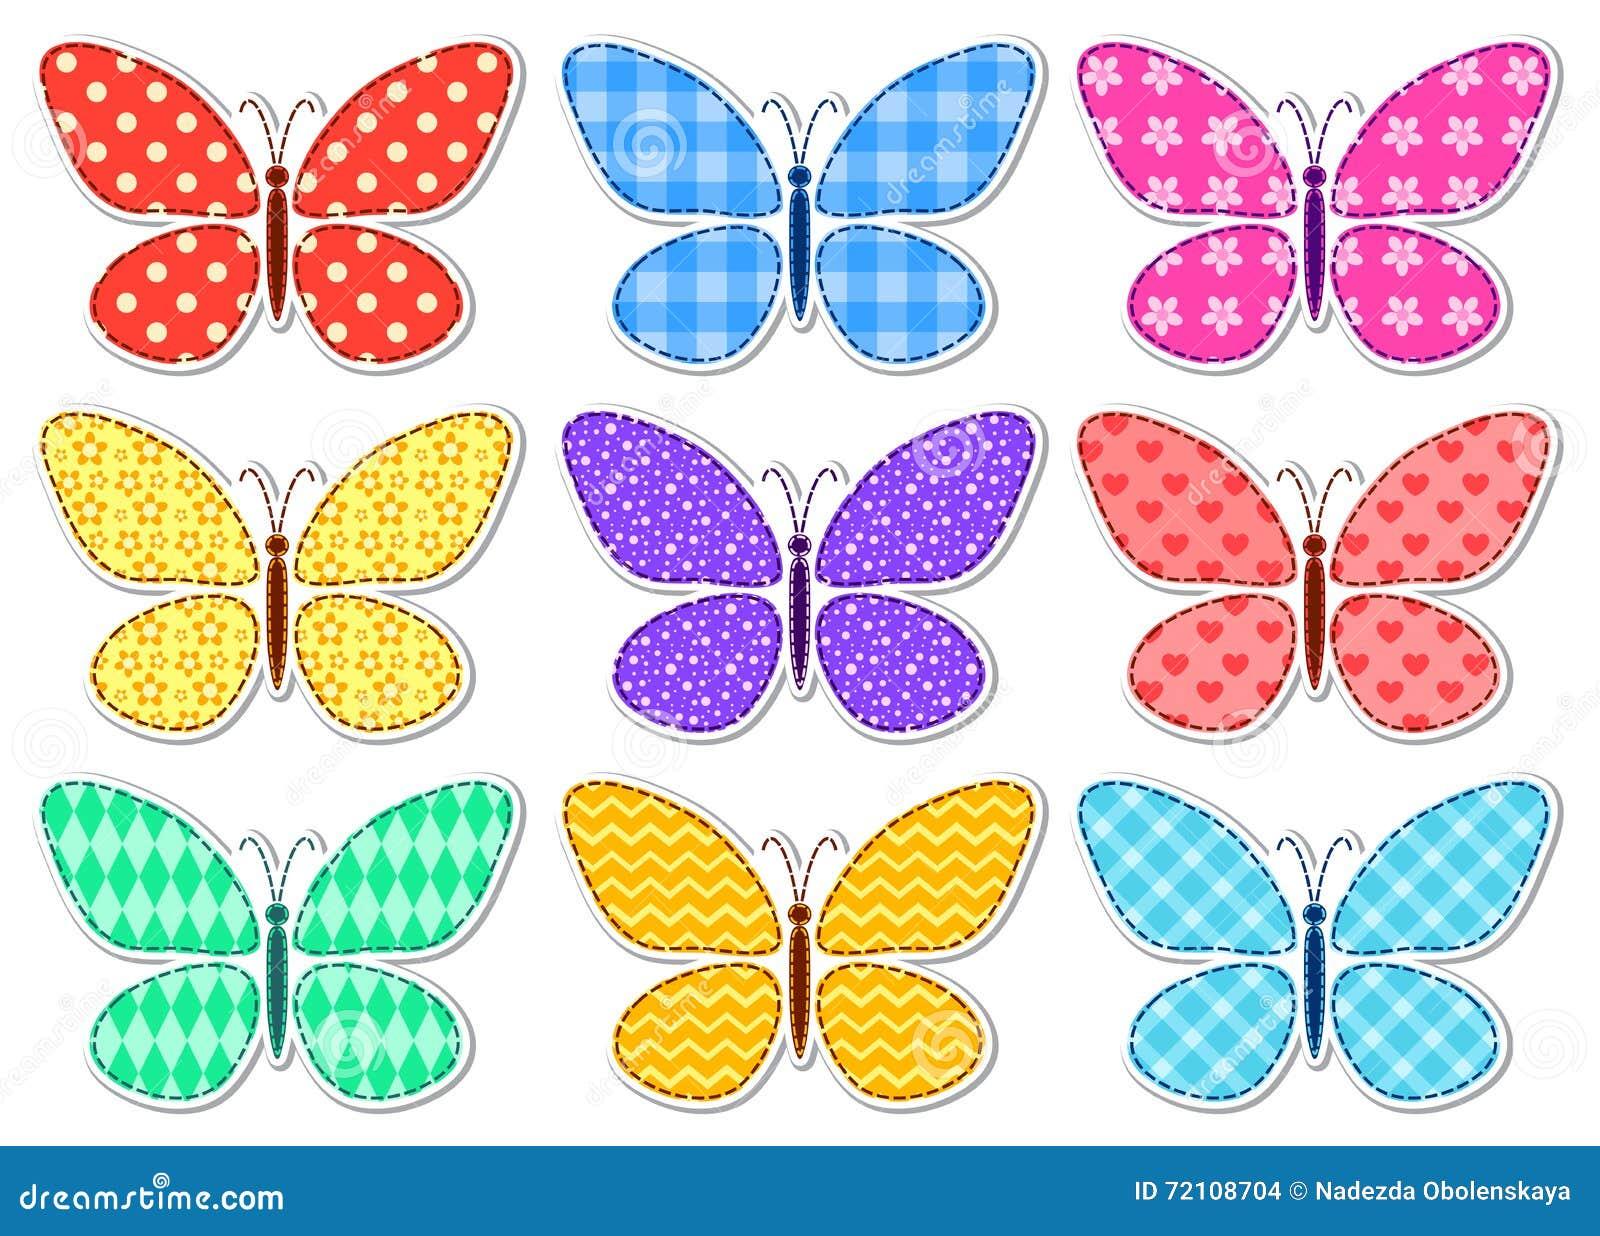 Uncategorized Images Of Butterflies For Children set of cute stickers patchwork butterflies for children stock children